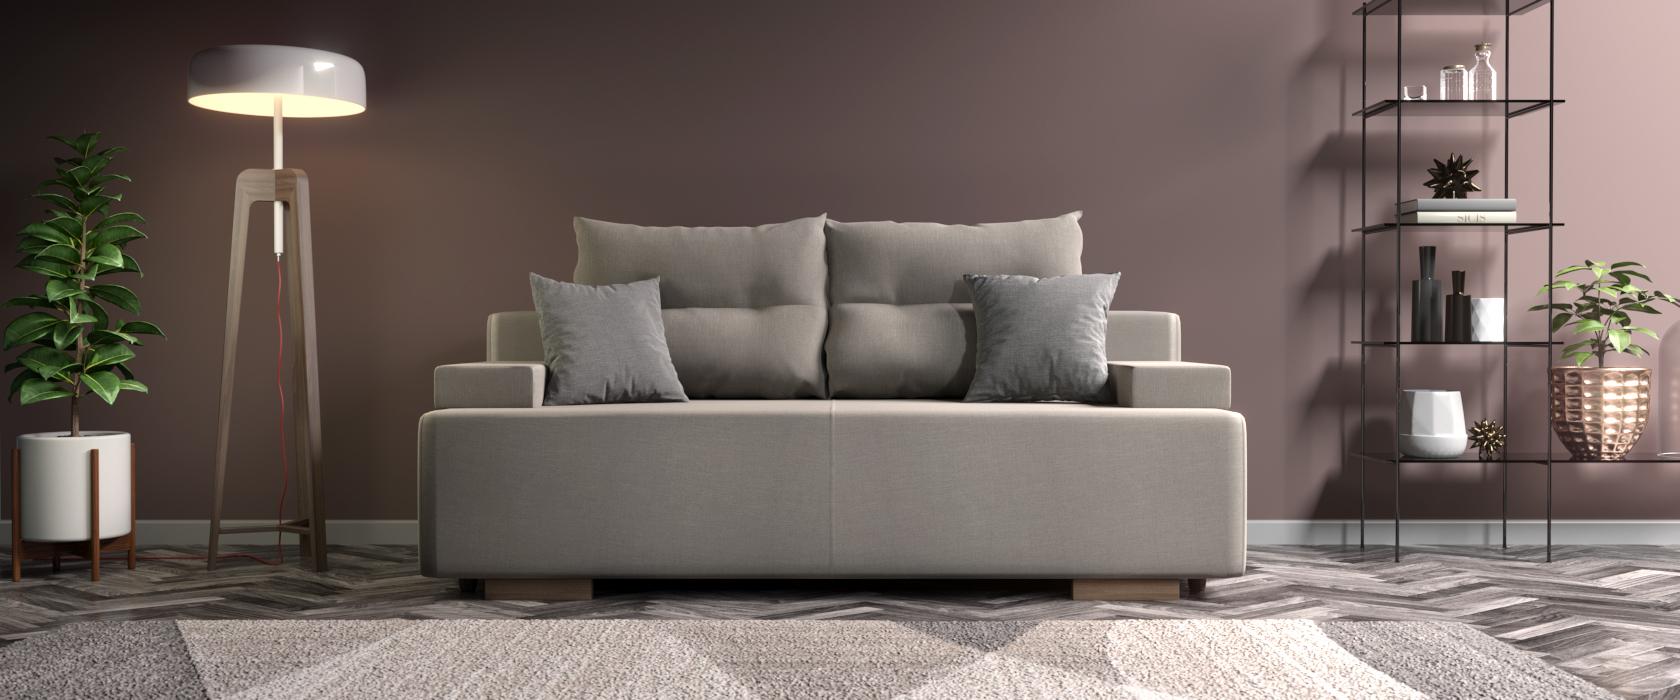 Трехместный диван Marta - Фото 1 - Pufetto